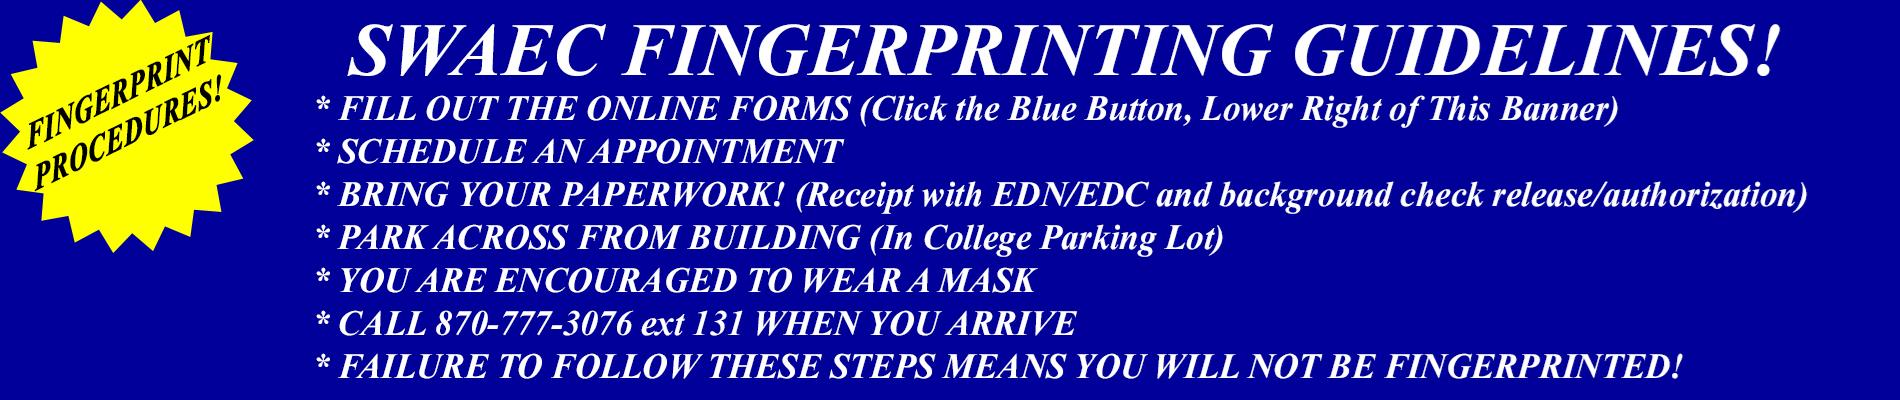 Please call 870-777-3076, extension 131 for fingerprinting